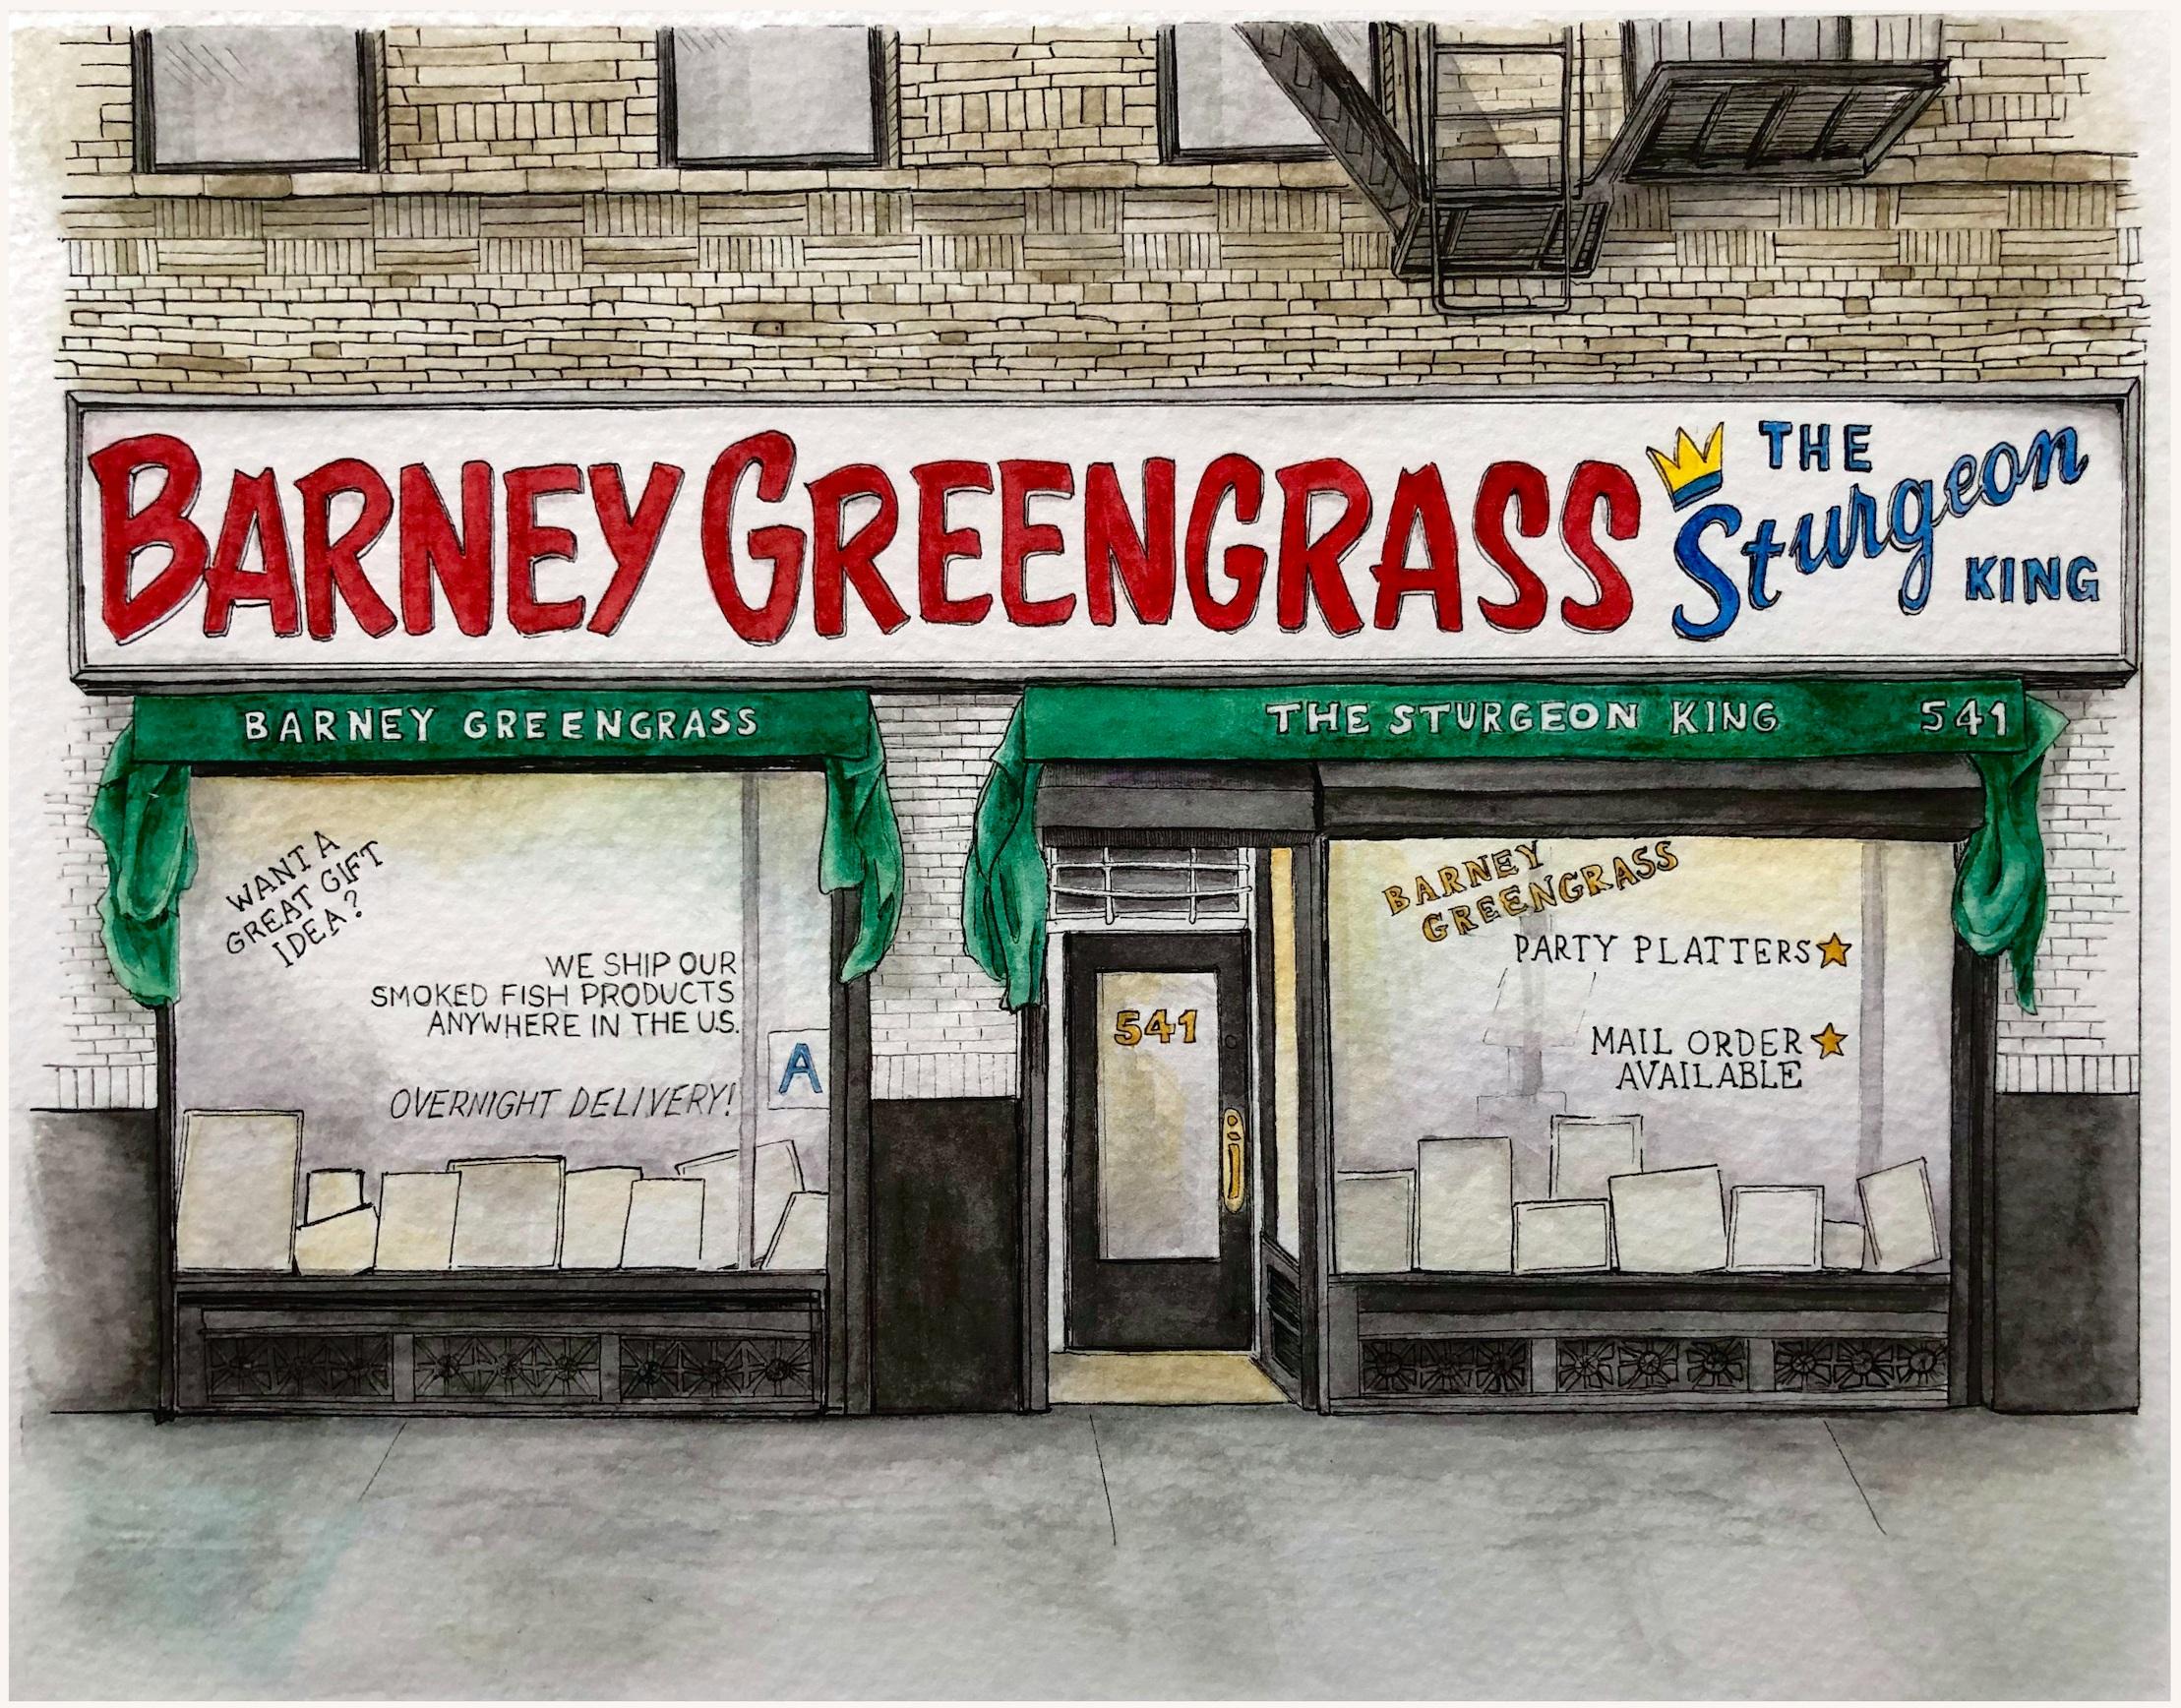 Barney Greengrass